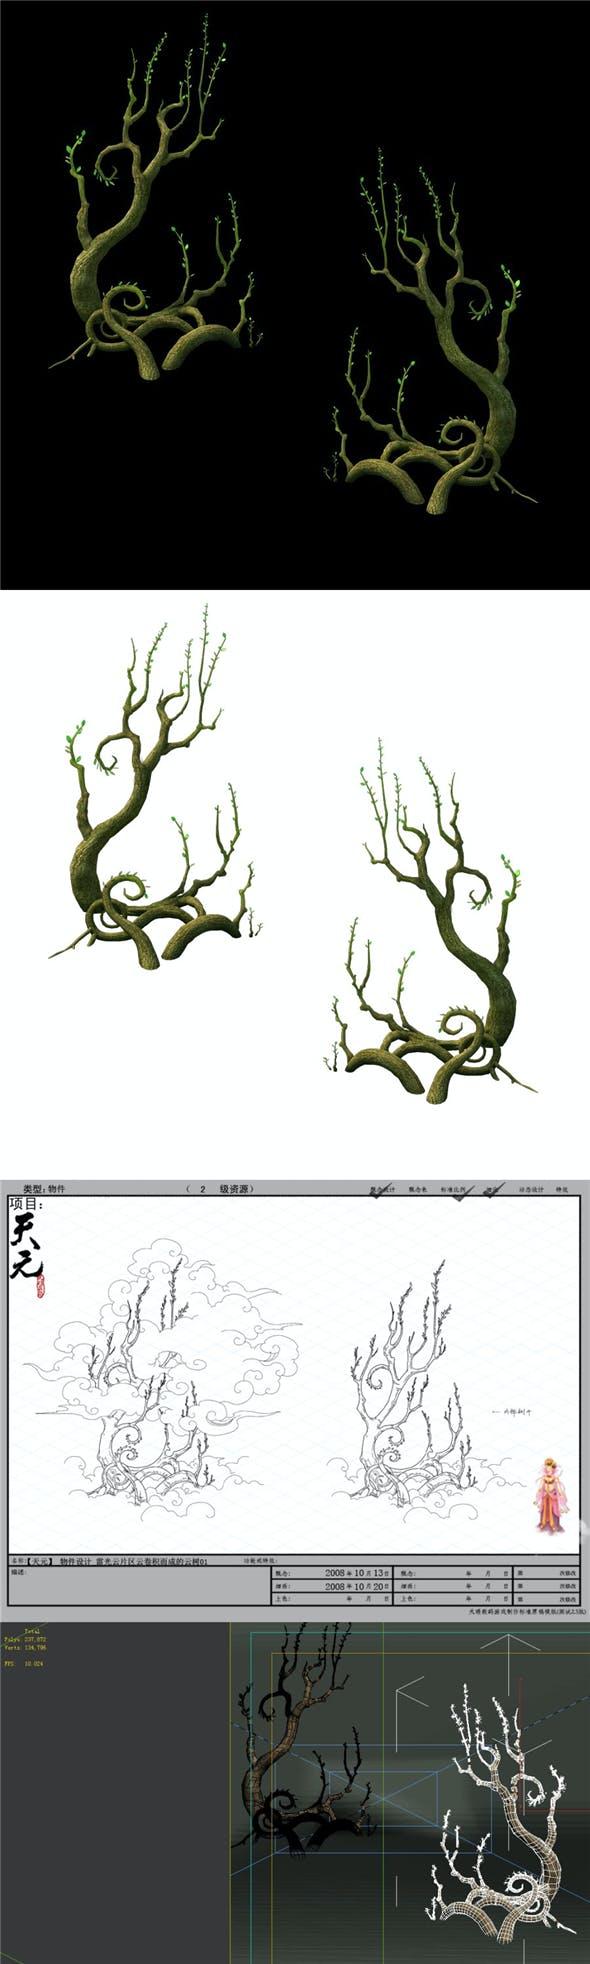 Game Model - Hanging Garden - Cloud Tree 01 - 3DOcean Item for Sale